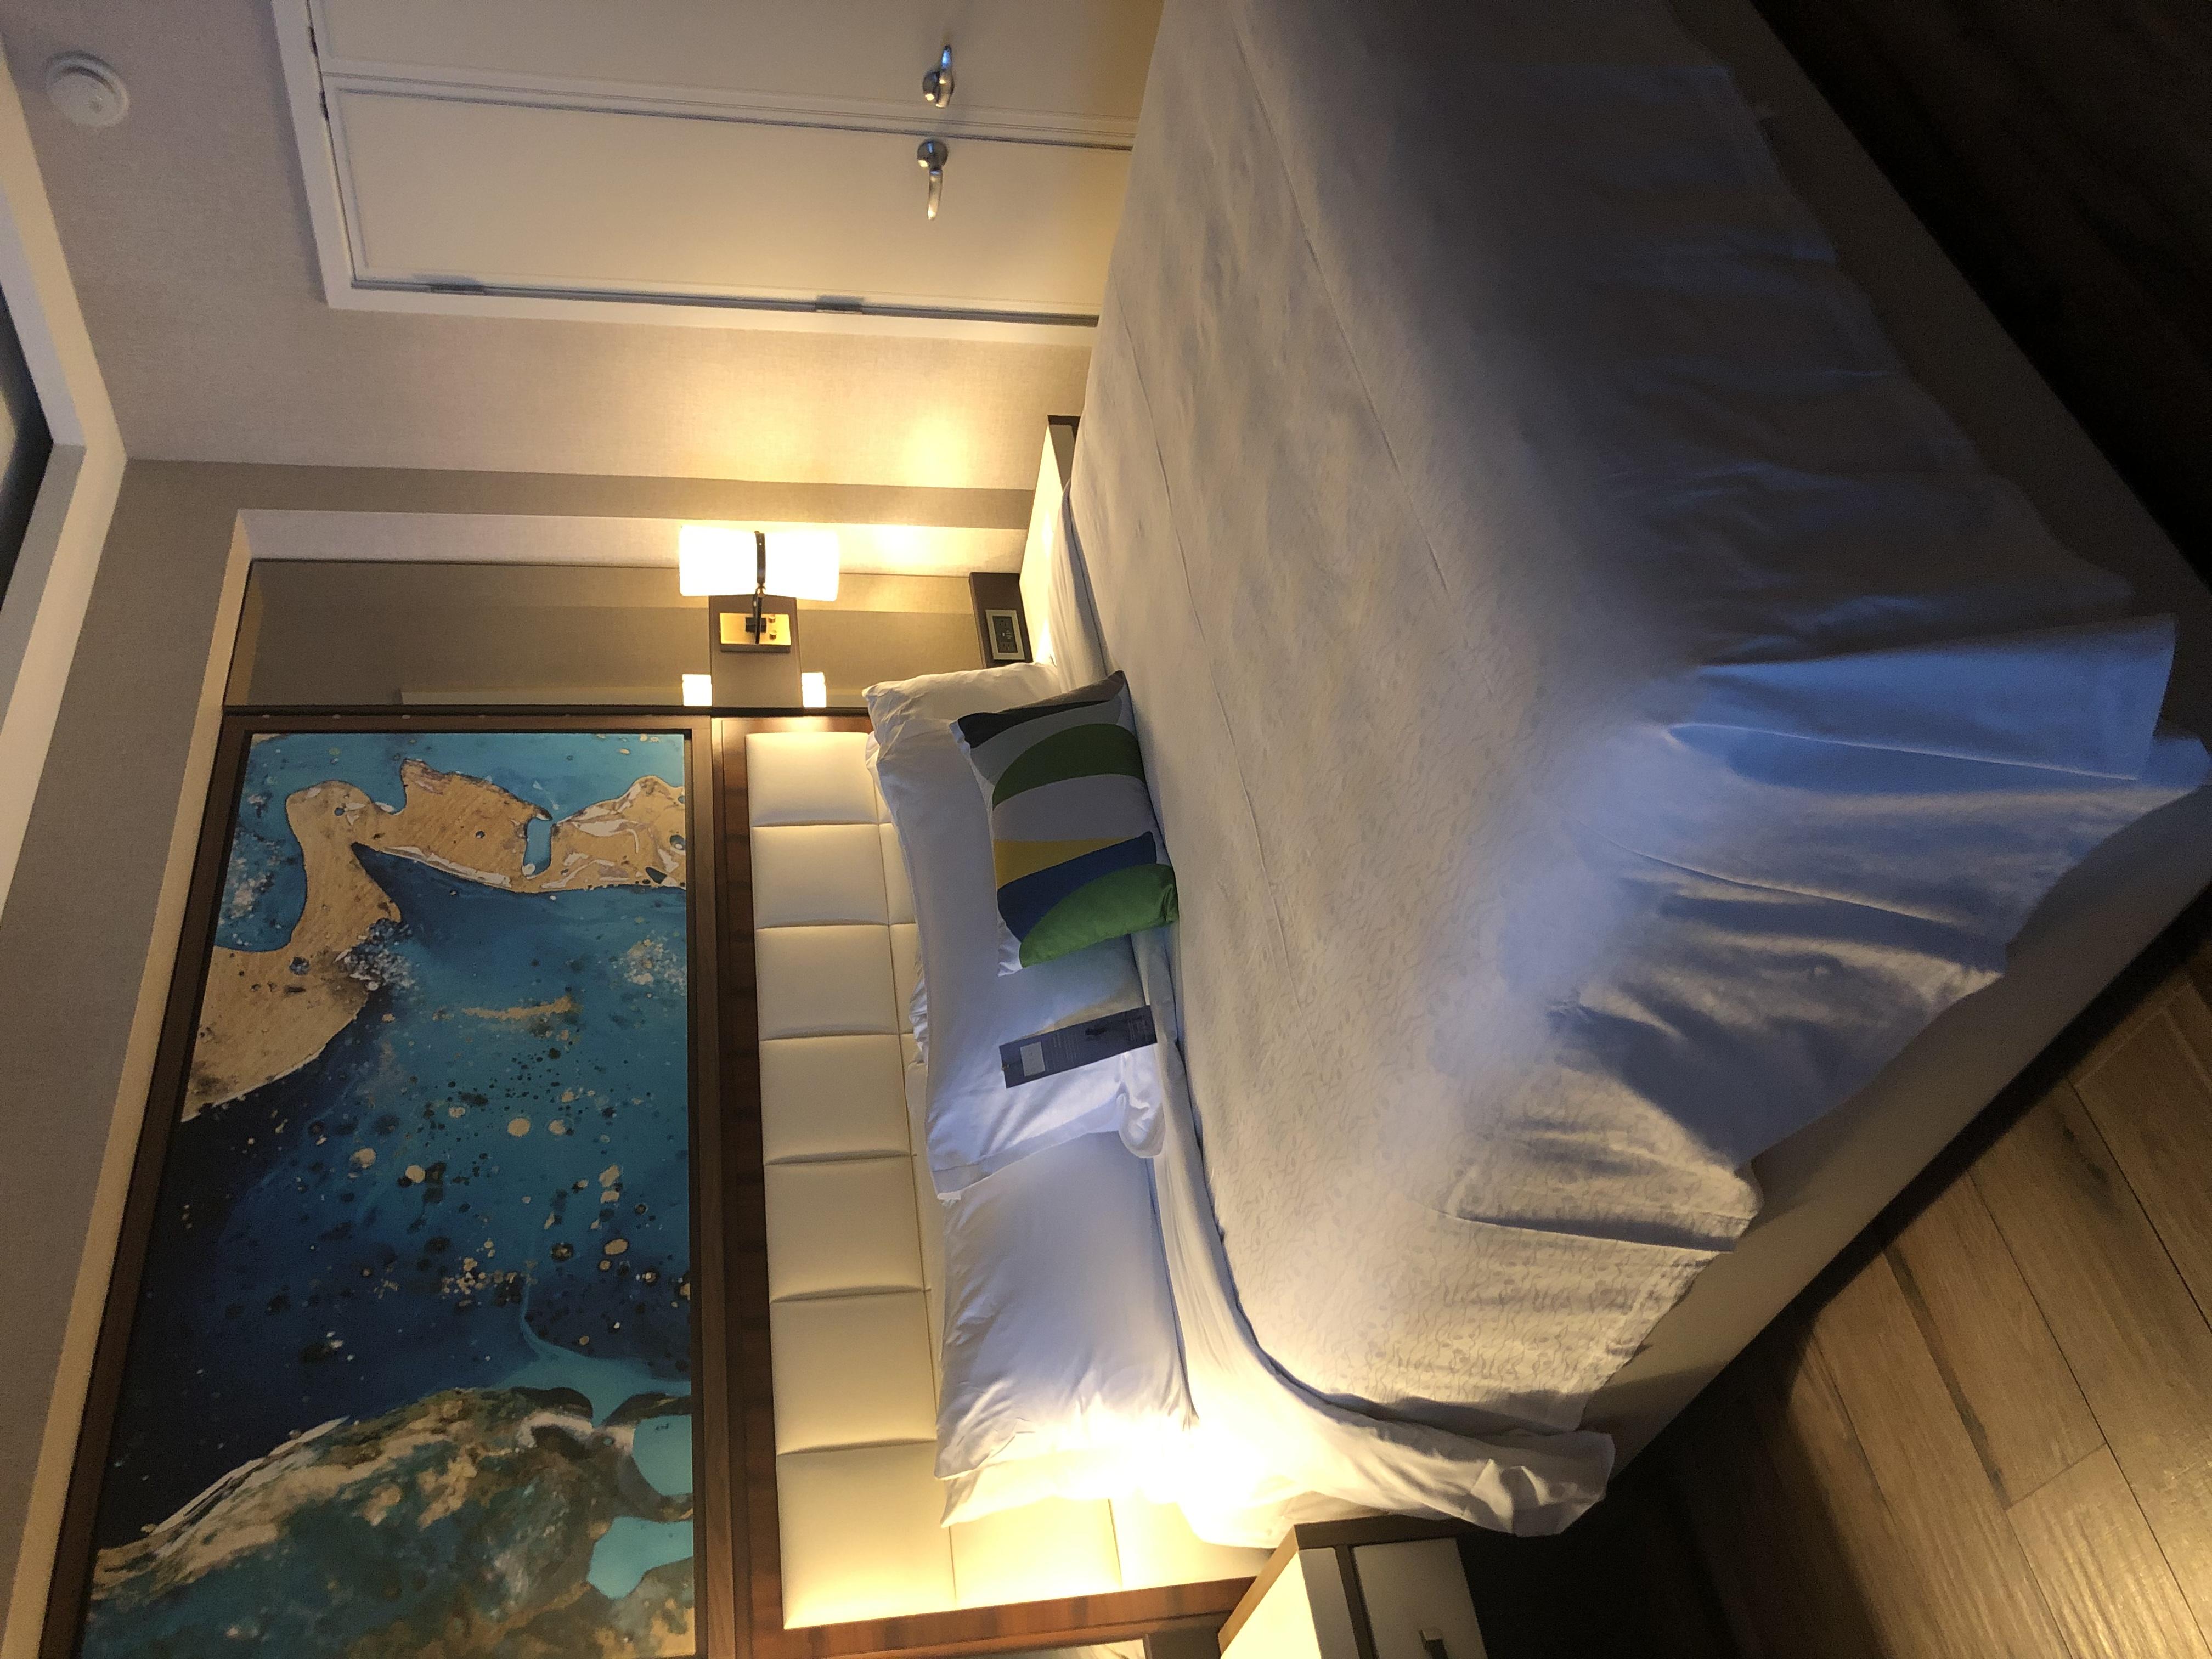 Conrad Ft. Lauderdale Beach Hotel